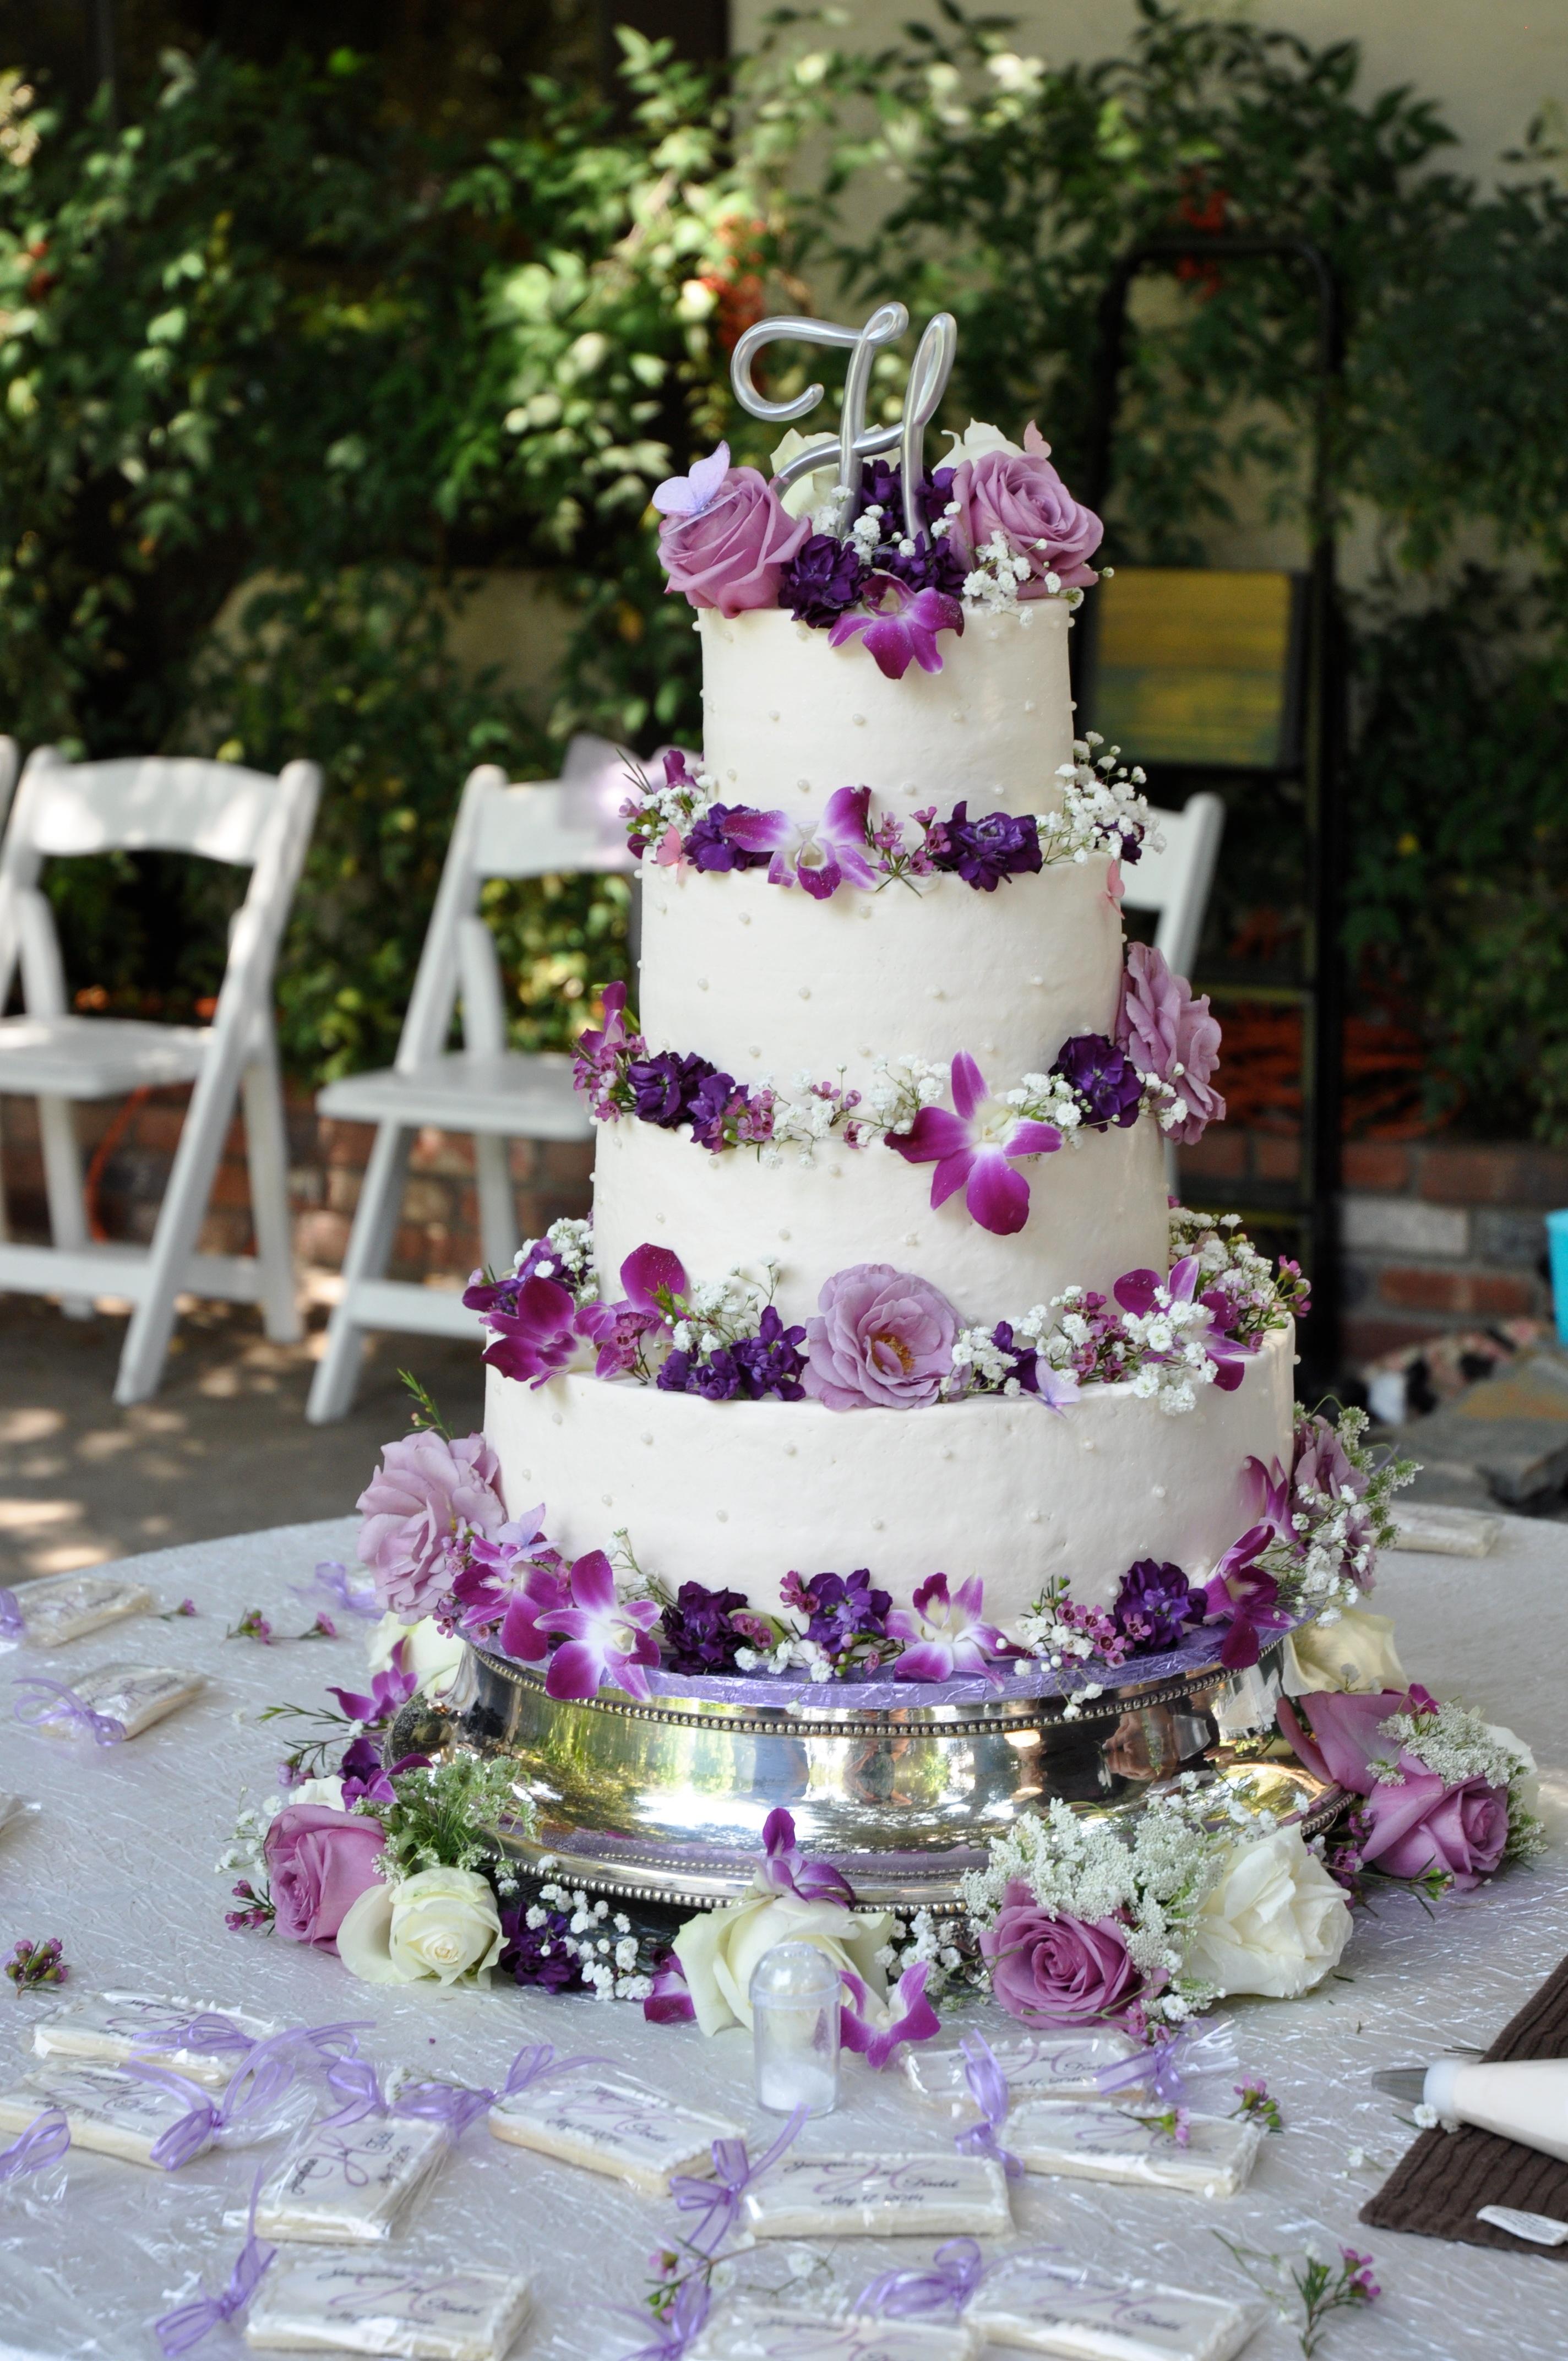 A Lavender Beauty